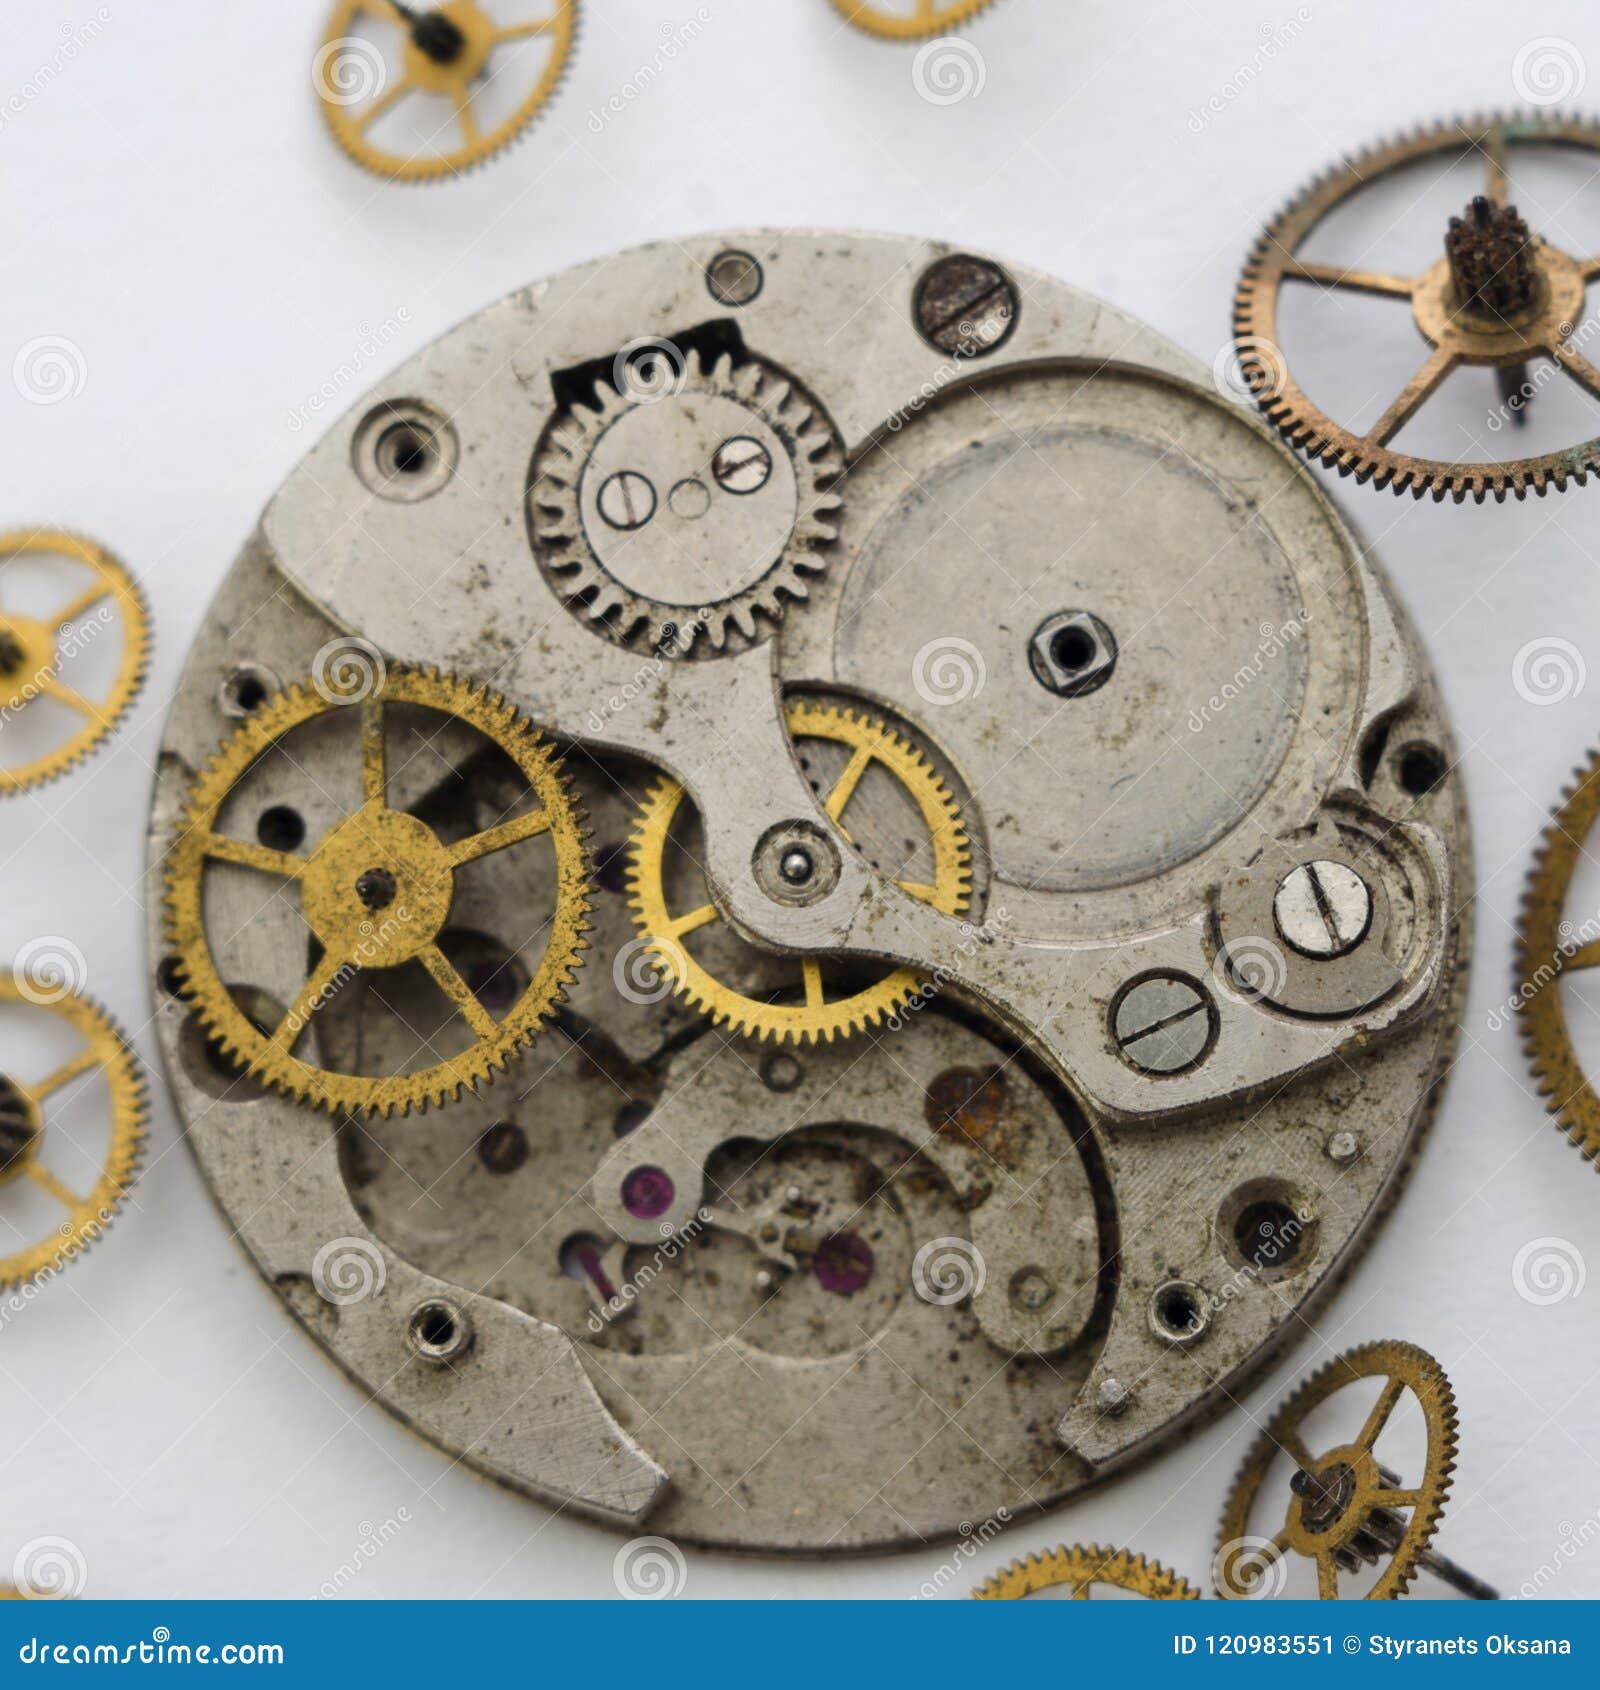 Maquinismo de relojoaria quebrado vintage no fundo branco